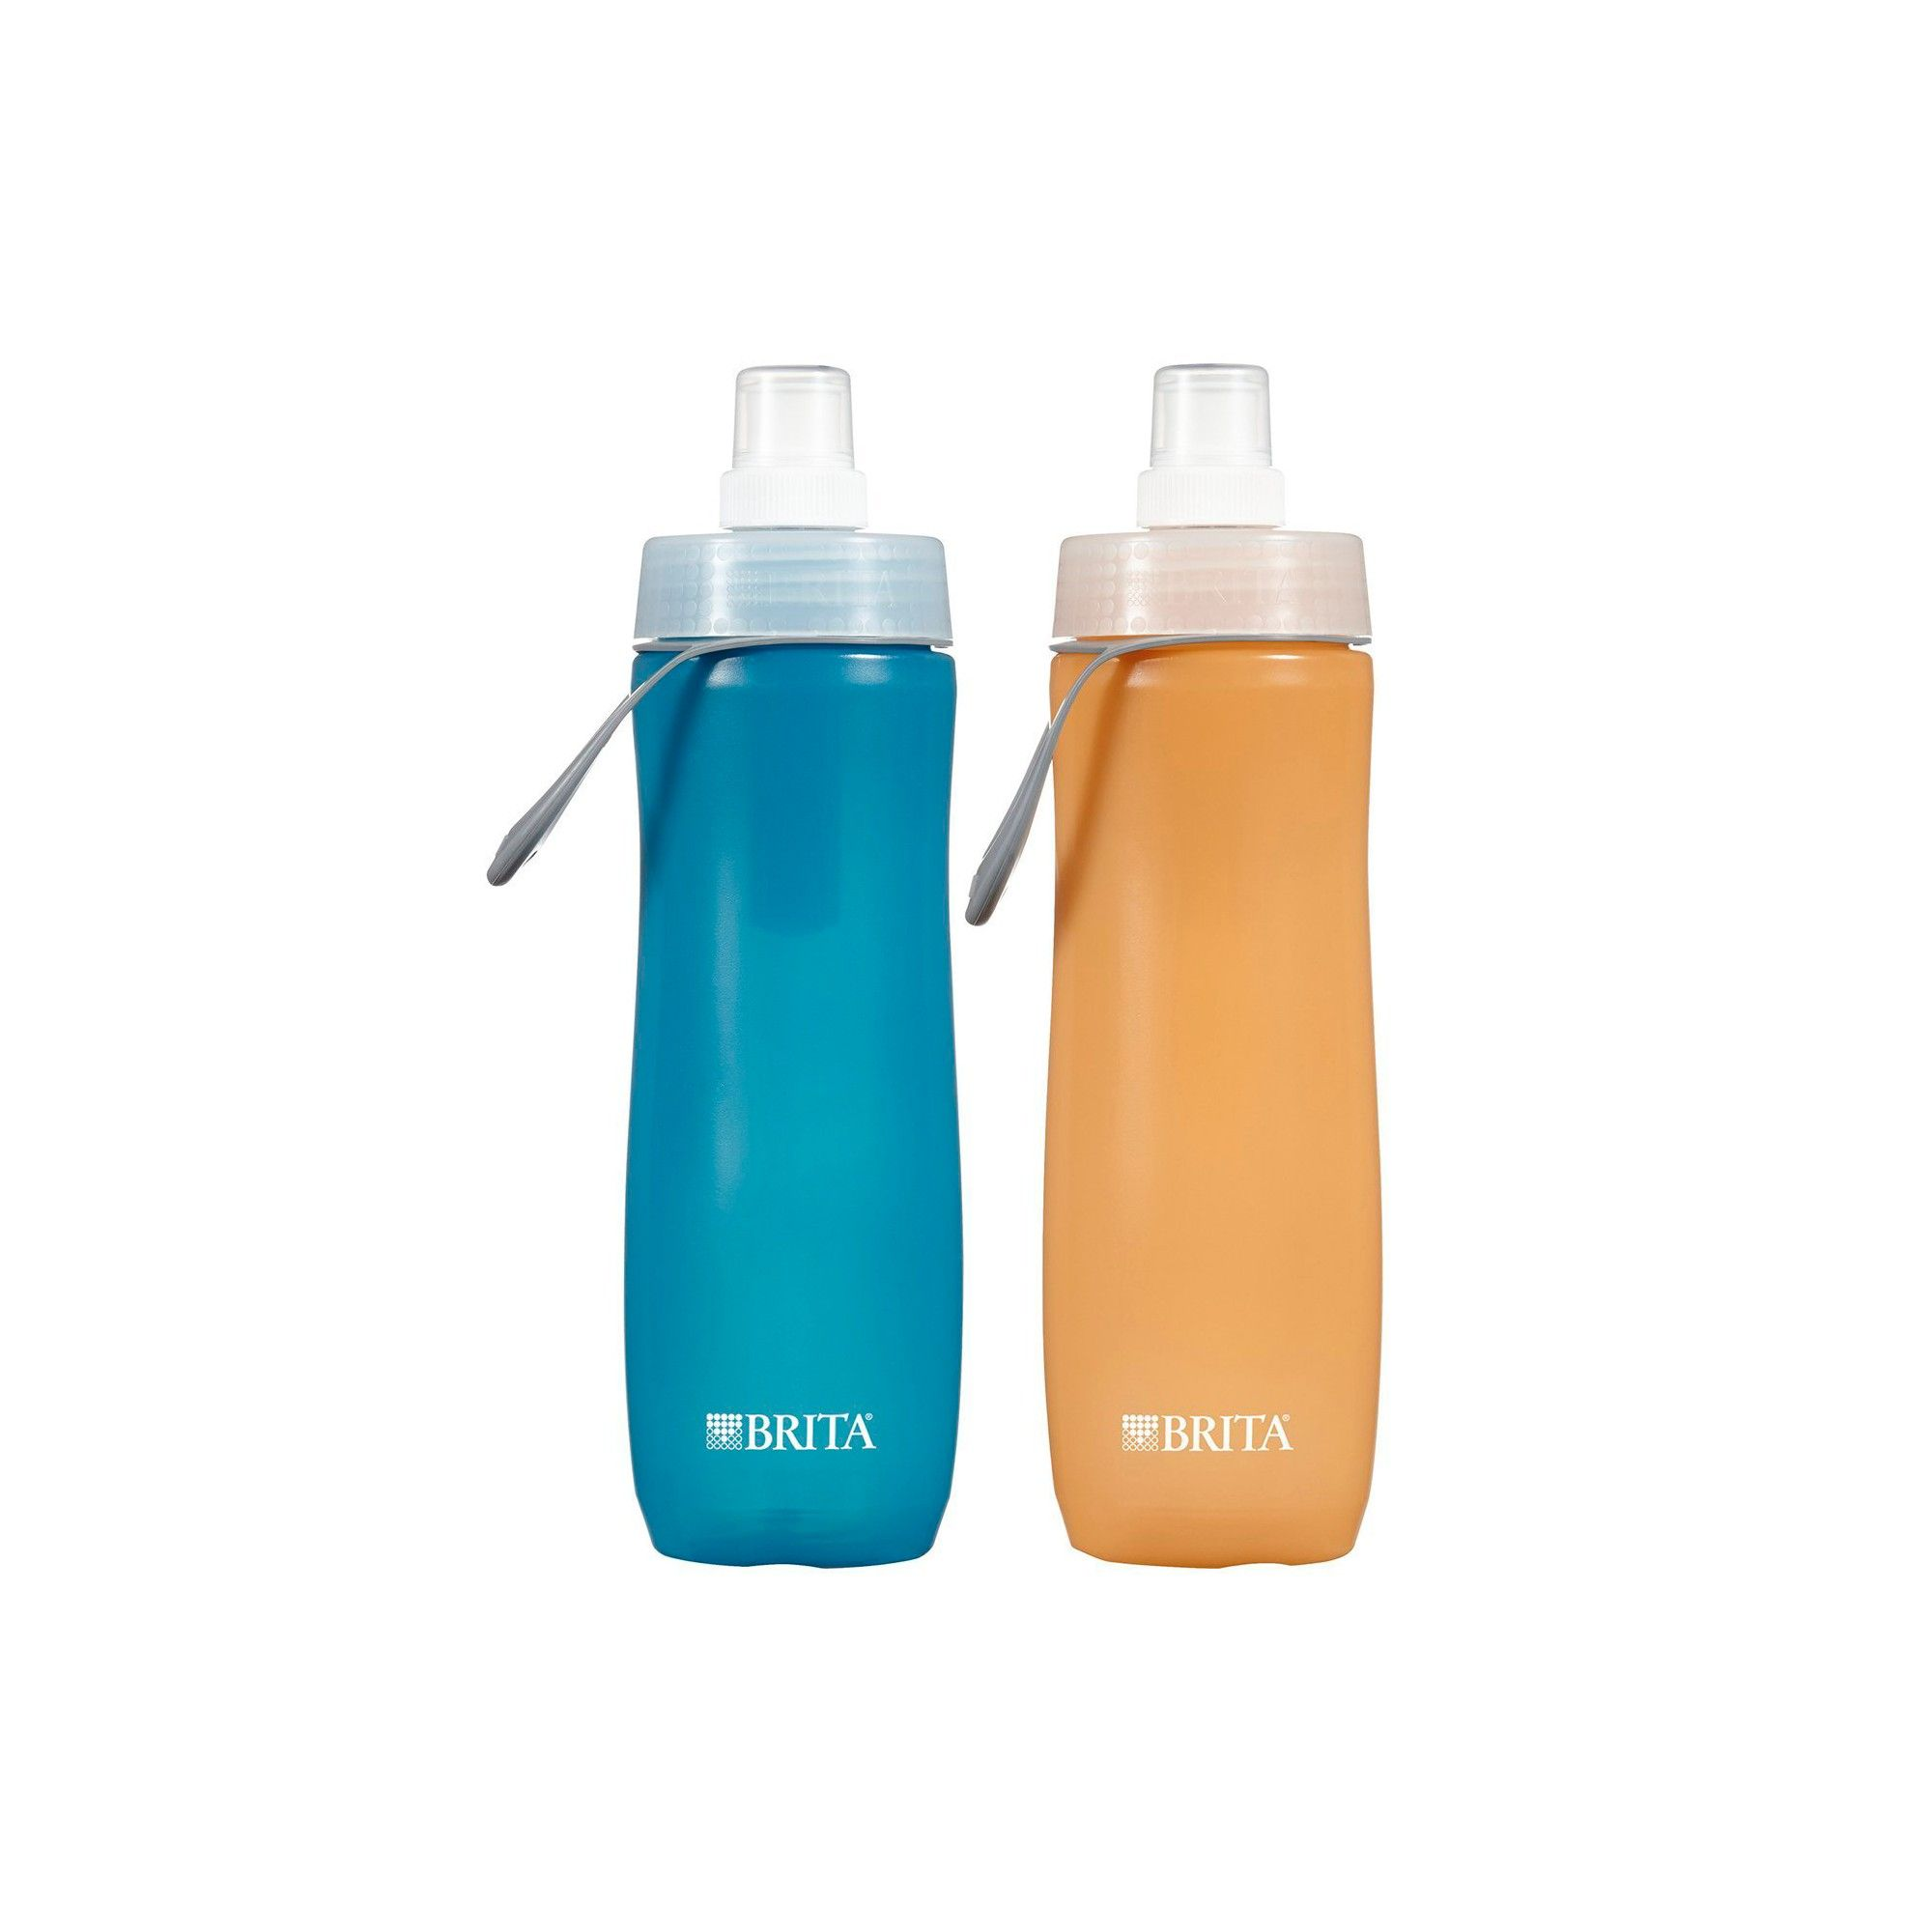 Brita sport 20 oz water bottle twin pack blue and orange